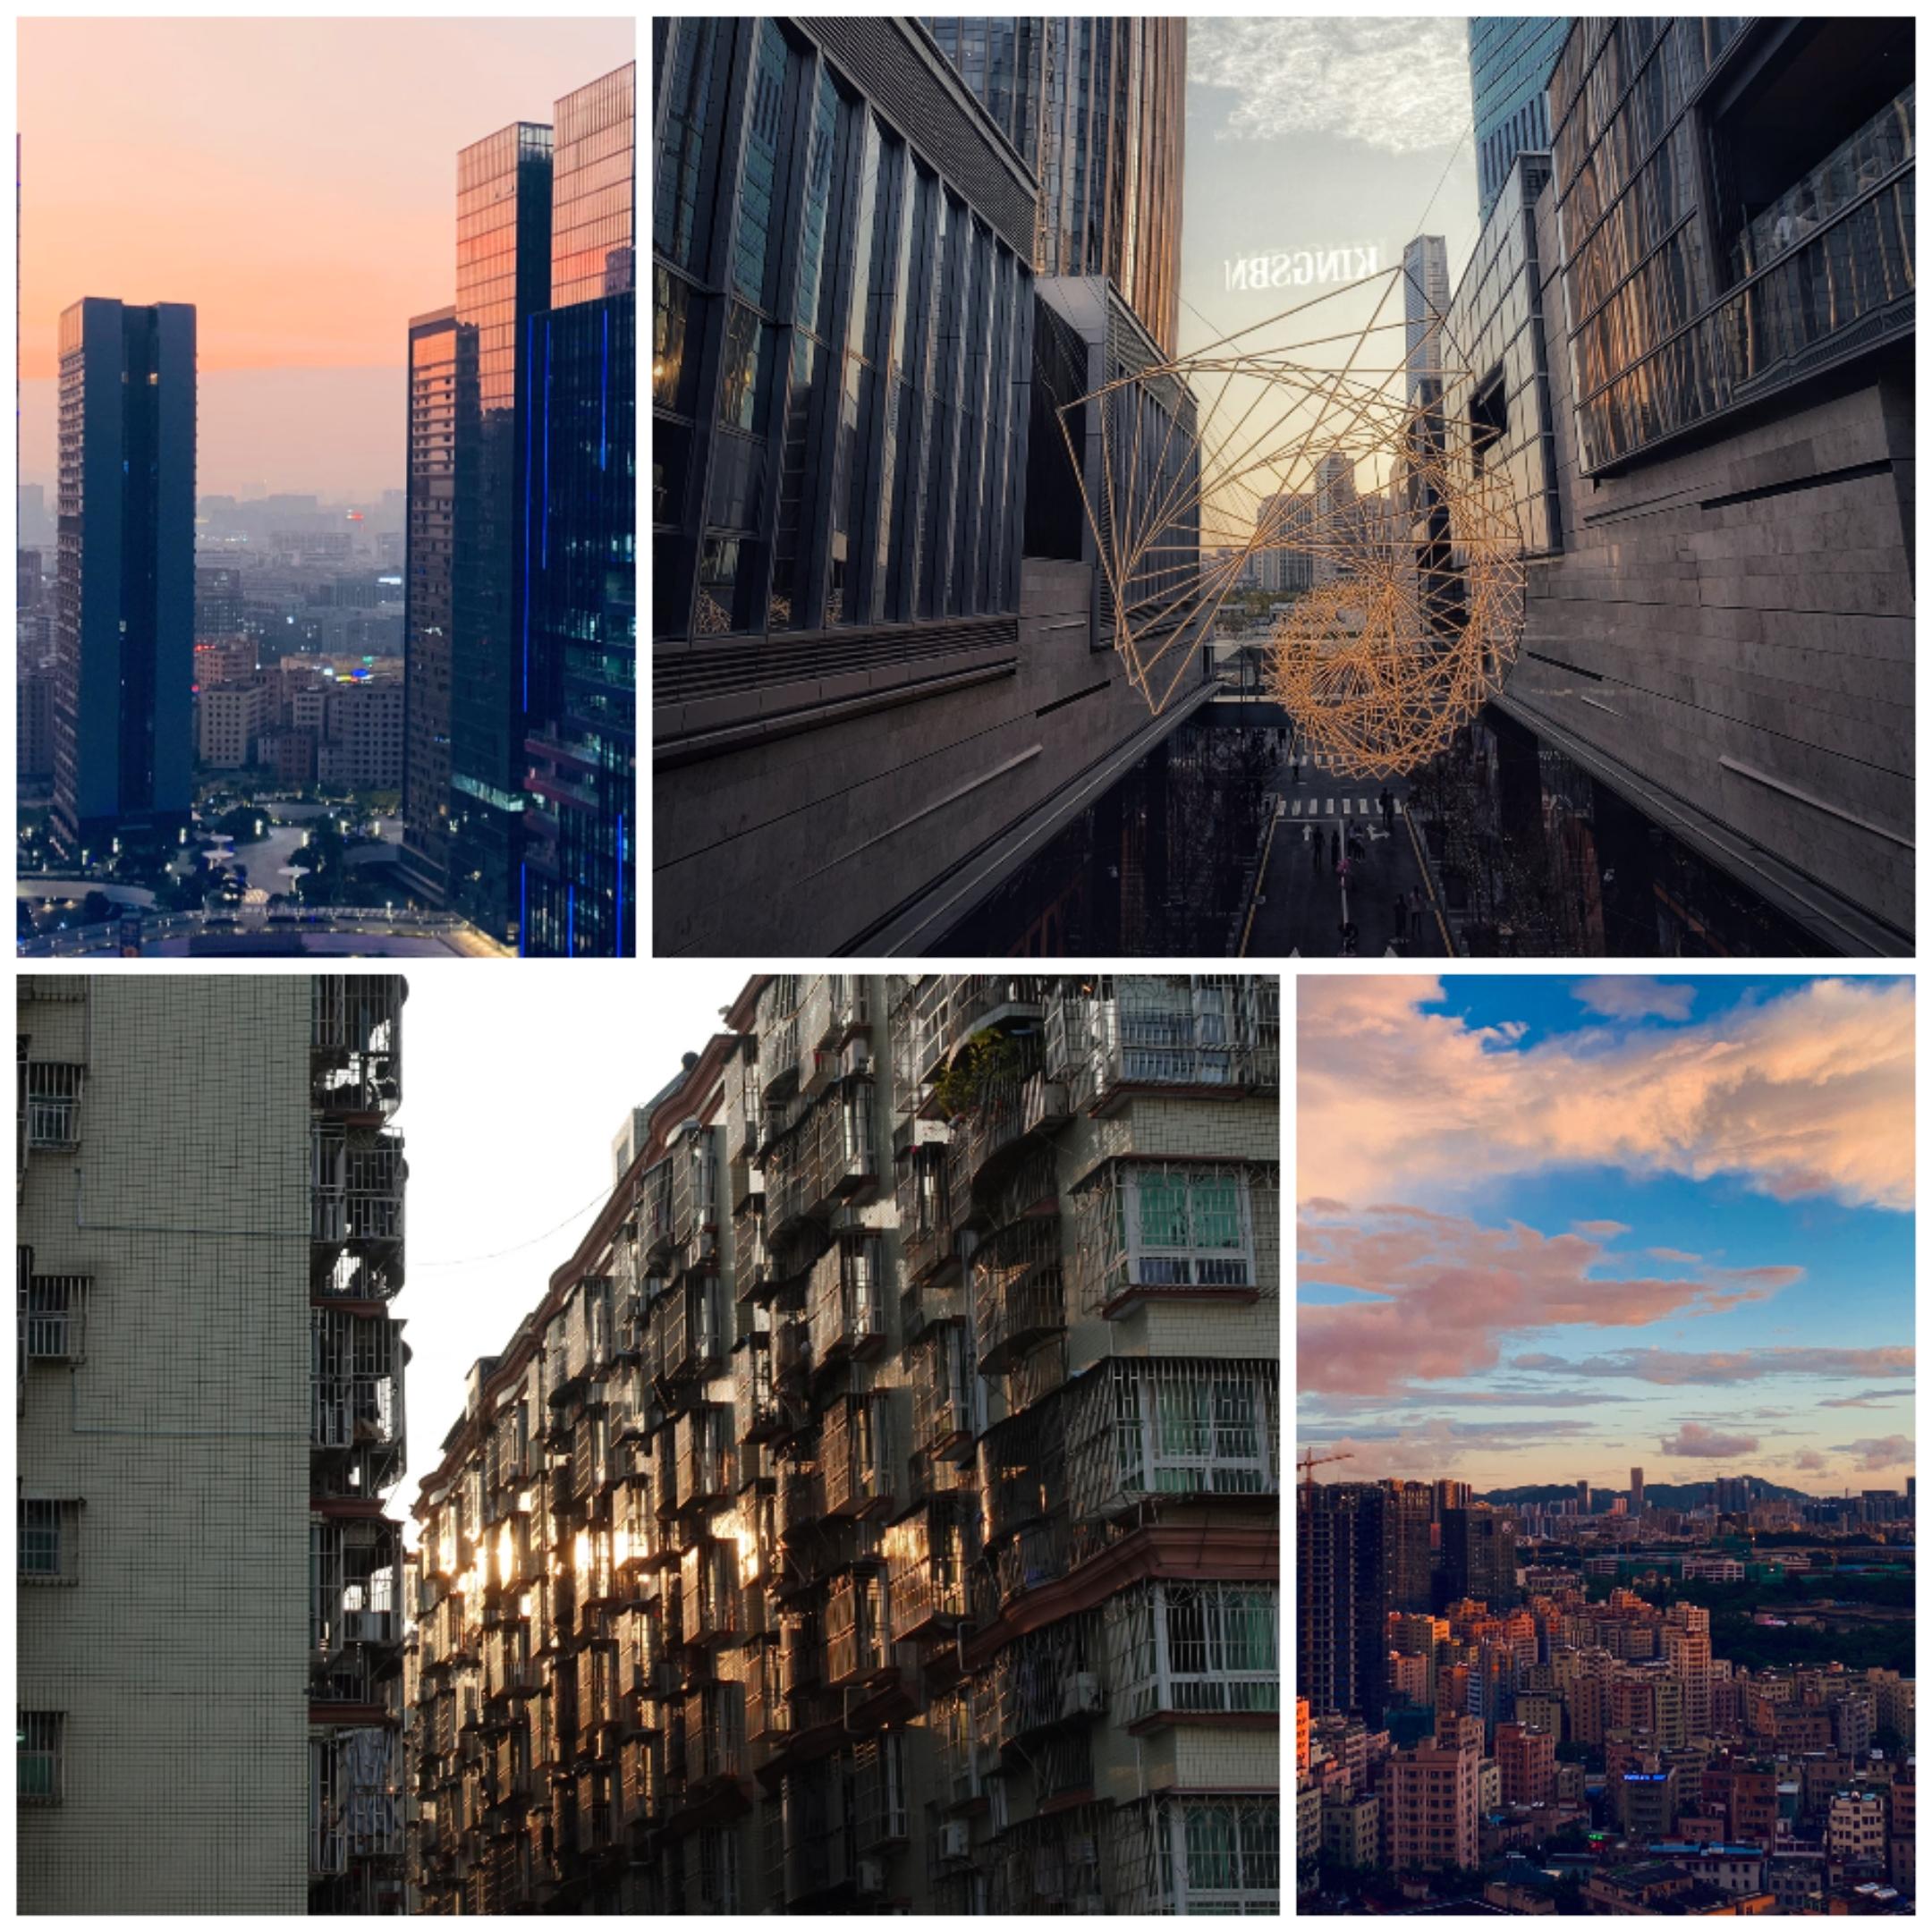 Collage_20201110_161125.jpg